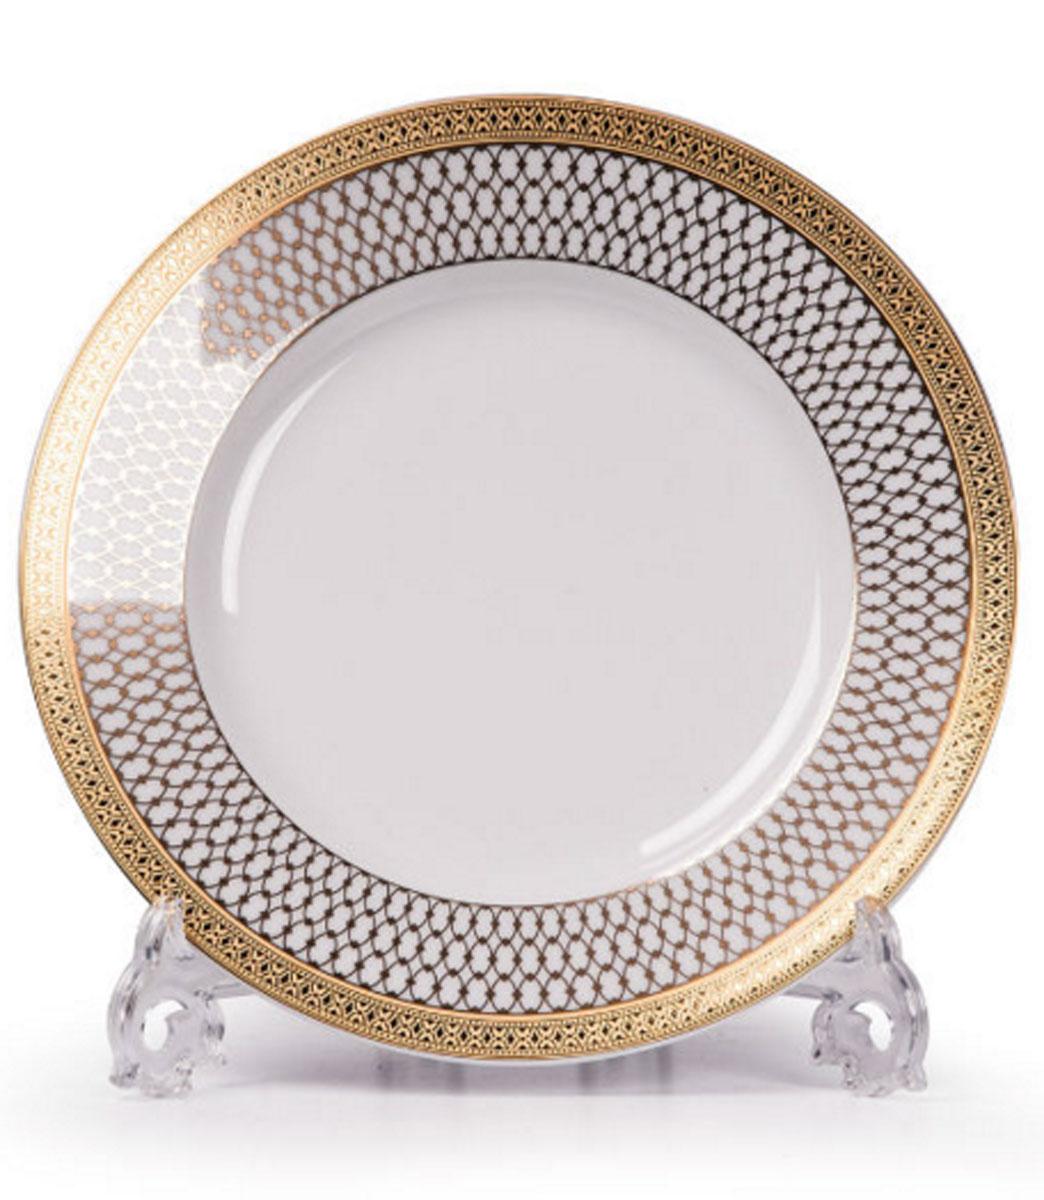 Mimosa Victoire Or 1488, набор тарелок 22см (6шт), цвет: белый с золотом5391171488В наборе тарелка 22 см 6 штук